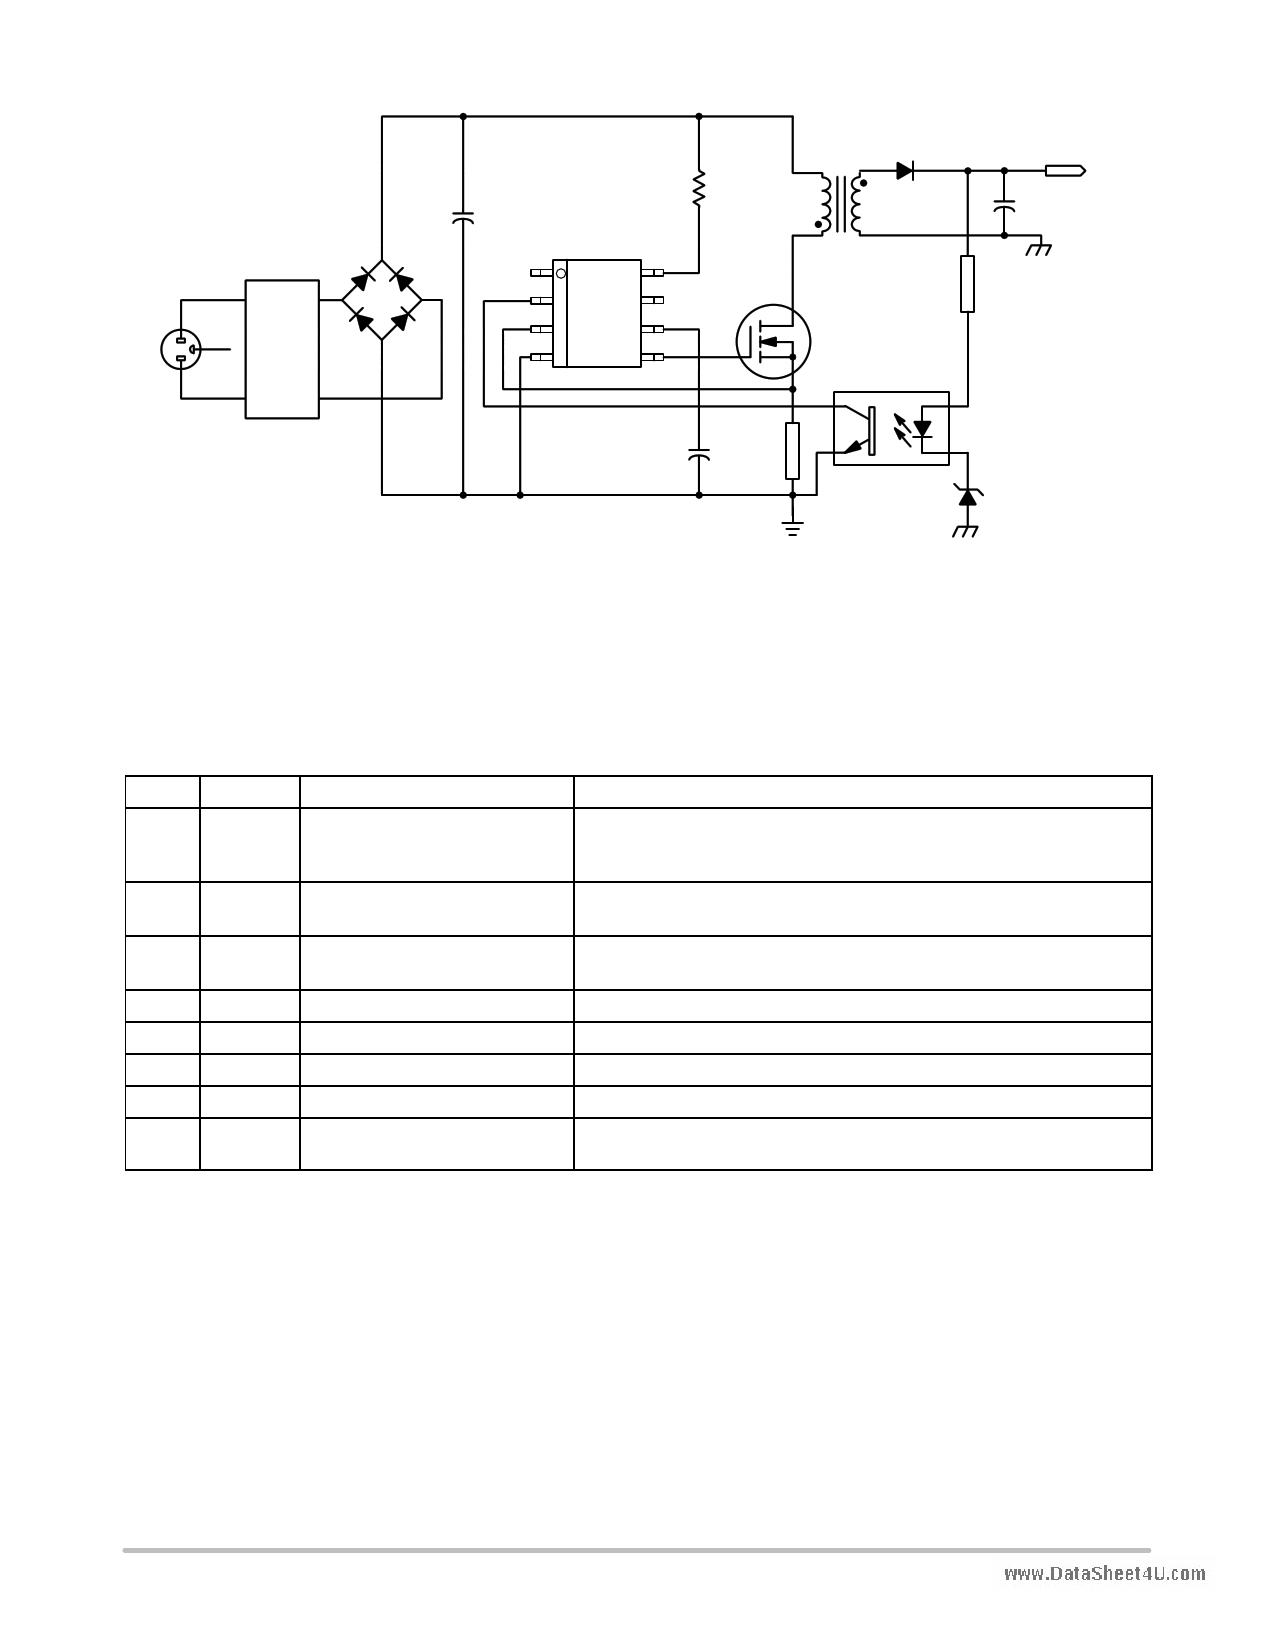 1200AP100 pdf schematic